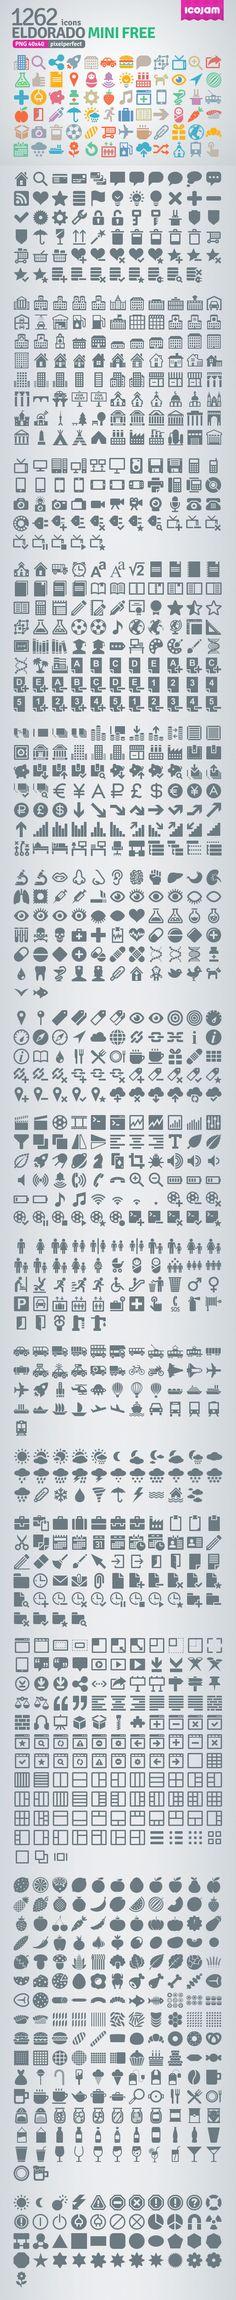 Eldorado - 1262 Free Icons - Just ideas for journaling Web Design, Tool Design, Print Design, Photoshop, Logo Typo, User Interface Design, Grafik Design, Graphic Design Inspiration, Typography Design